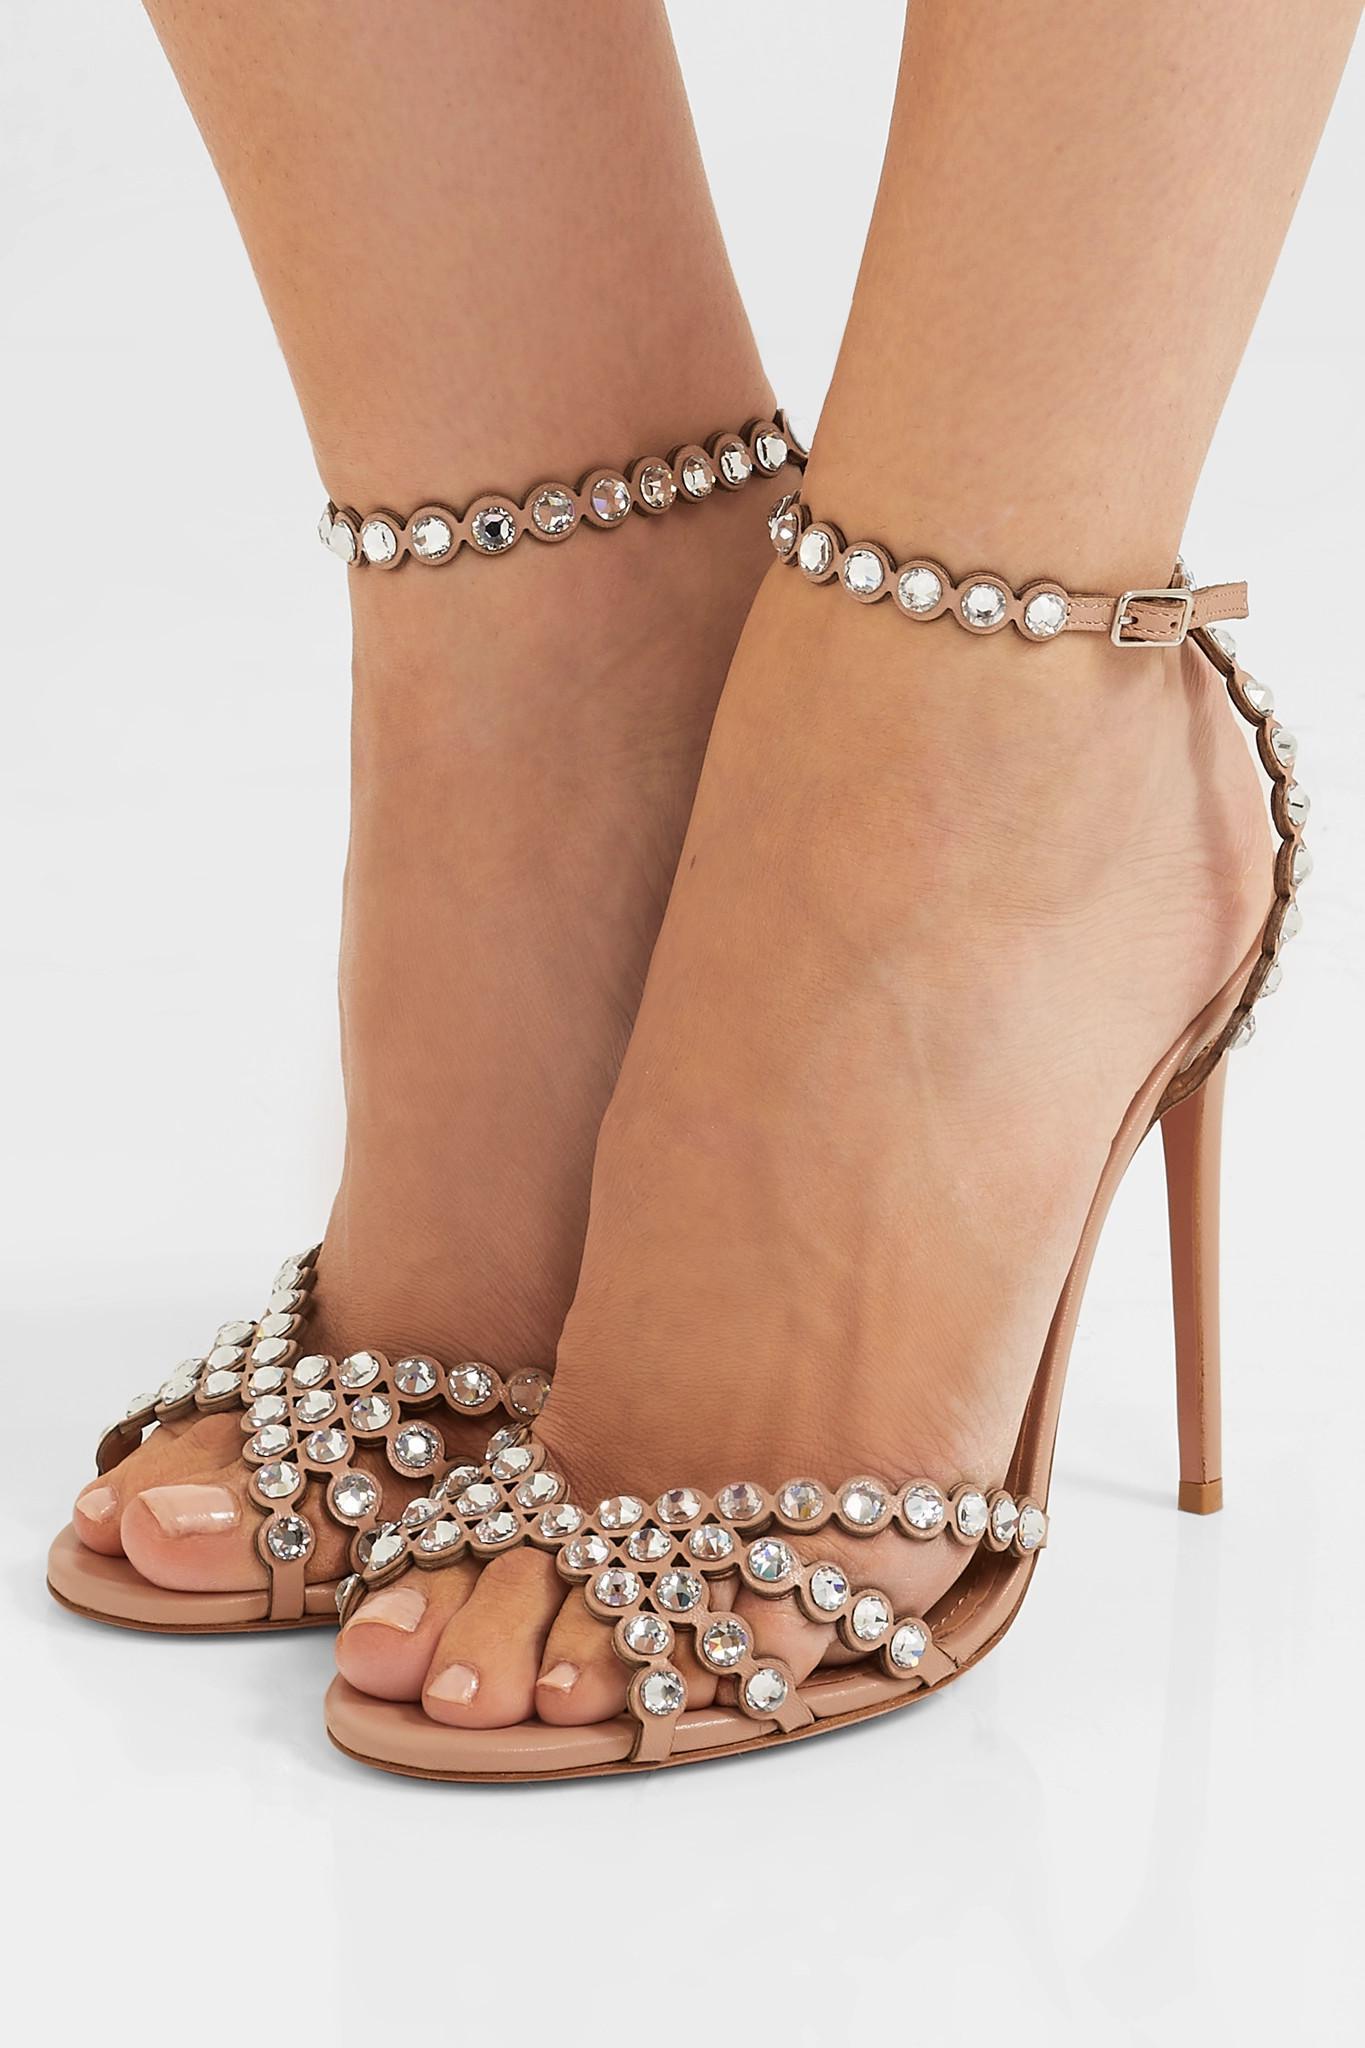 d9ec825ad Aquazzura - Multicolor Tequila 105 Crystal-embellished Leather Sandals -  Lyst. View fullscreen